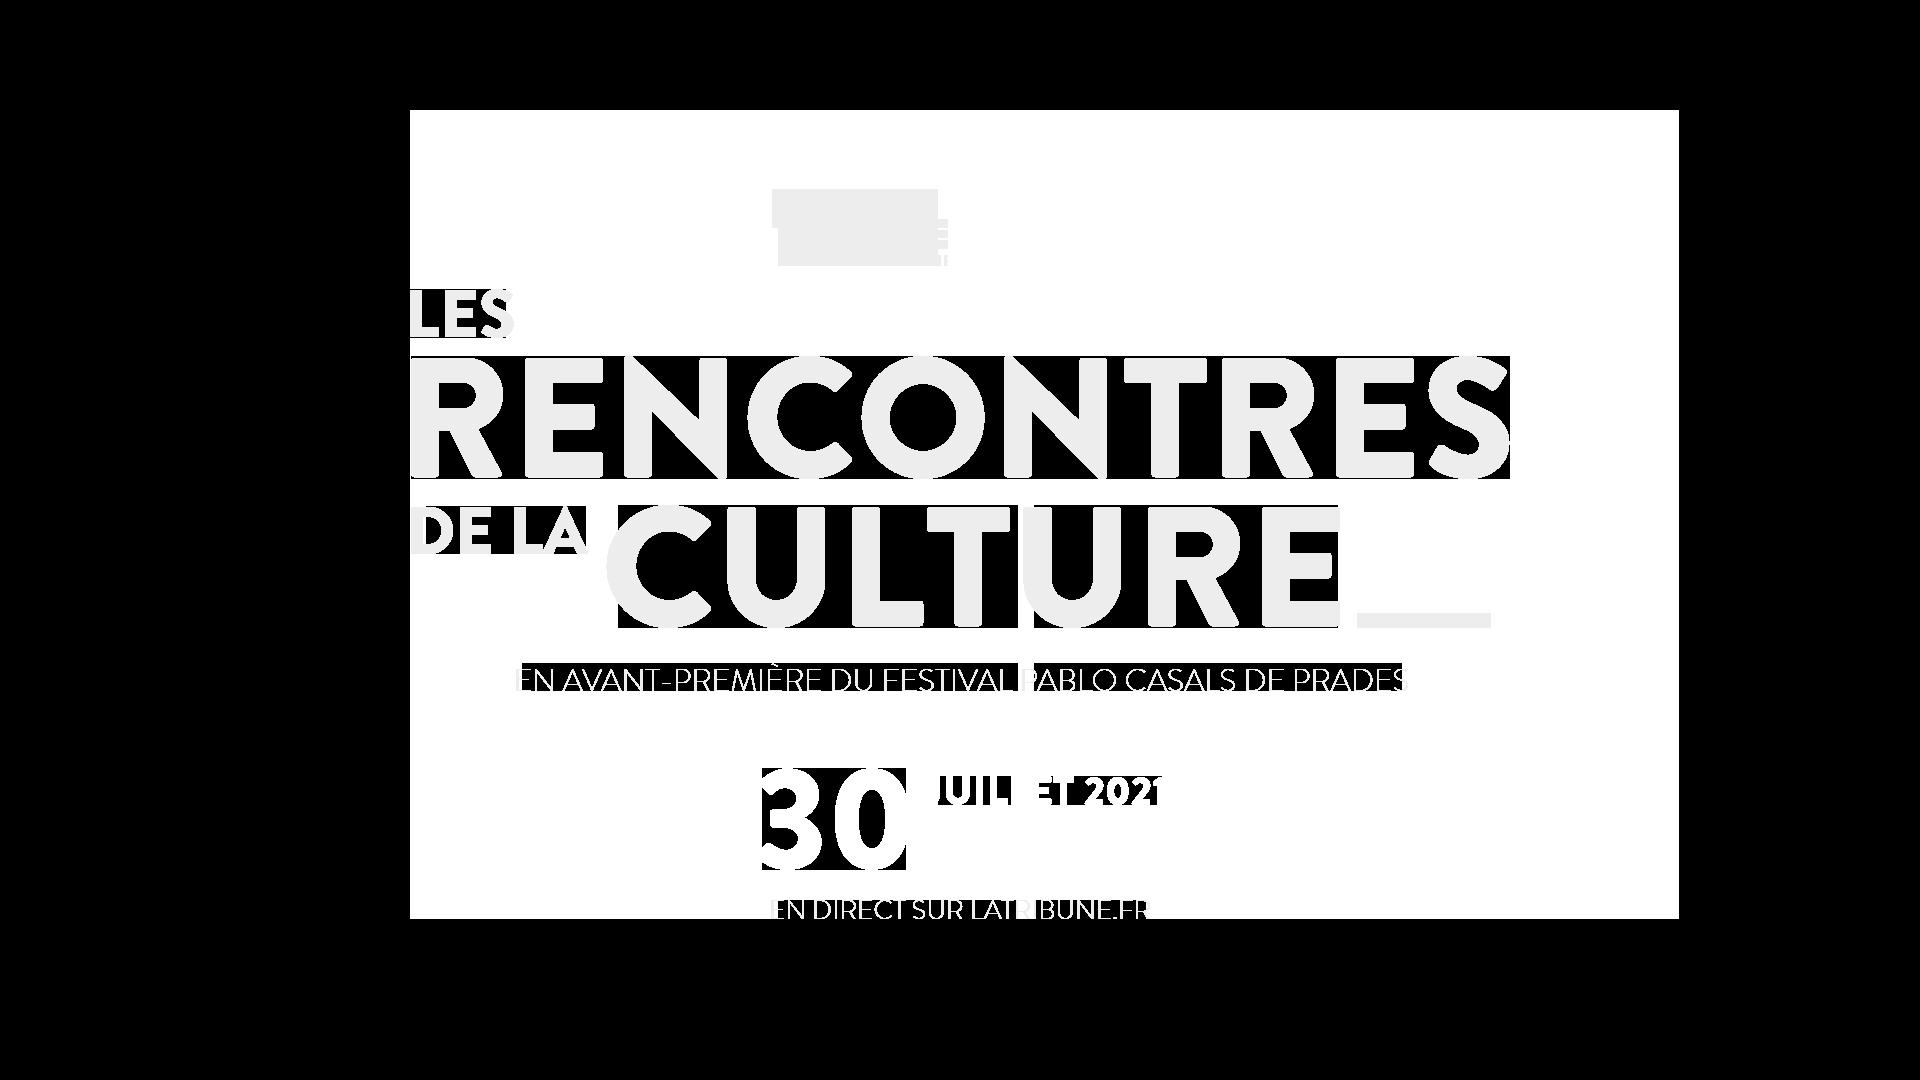 RENCONTRES_CULTURE_2021_SITE_1920x1080